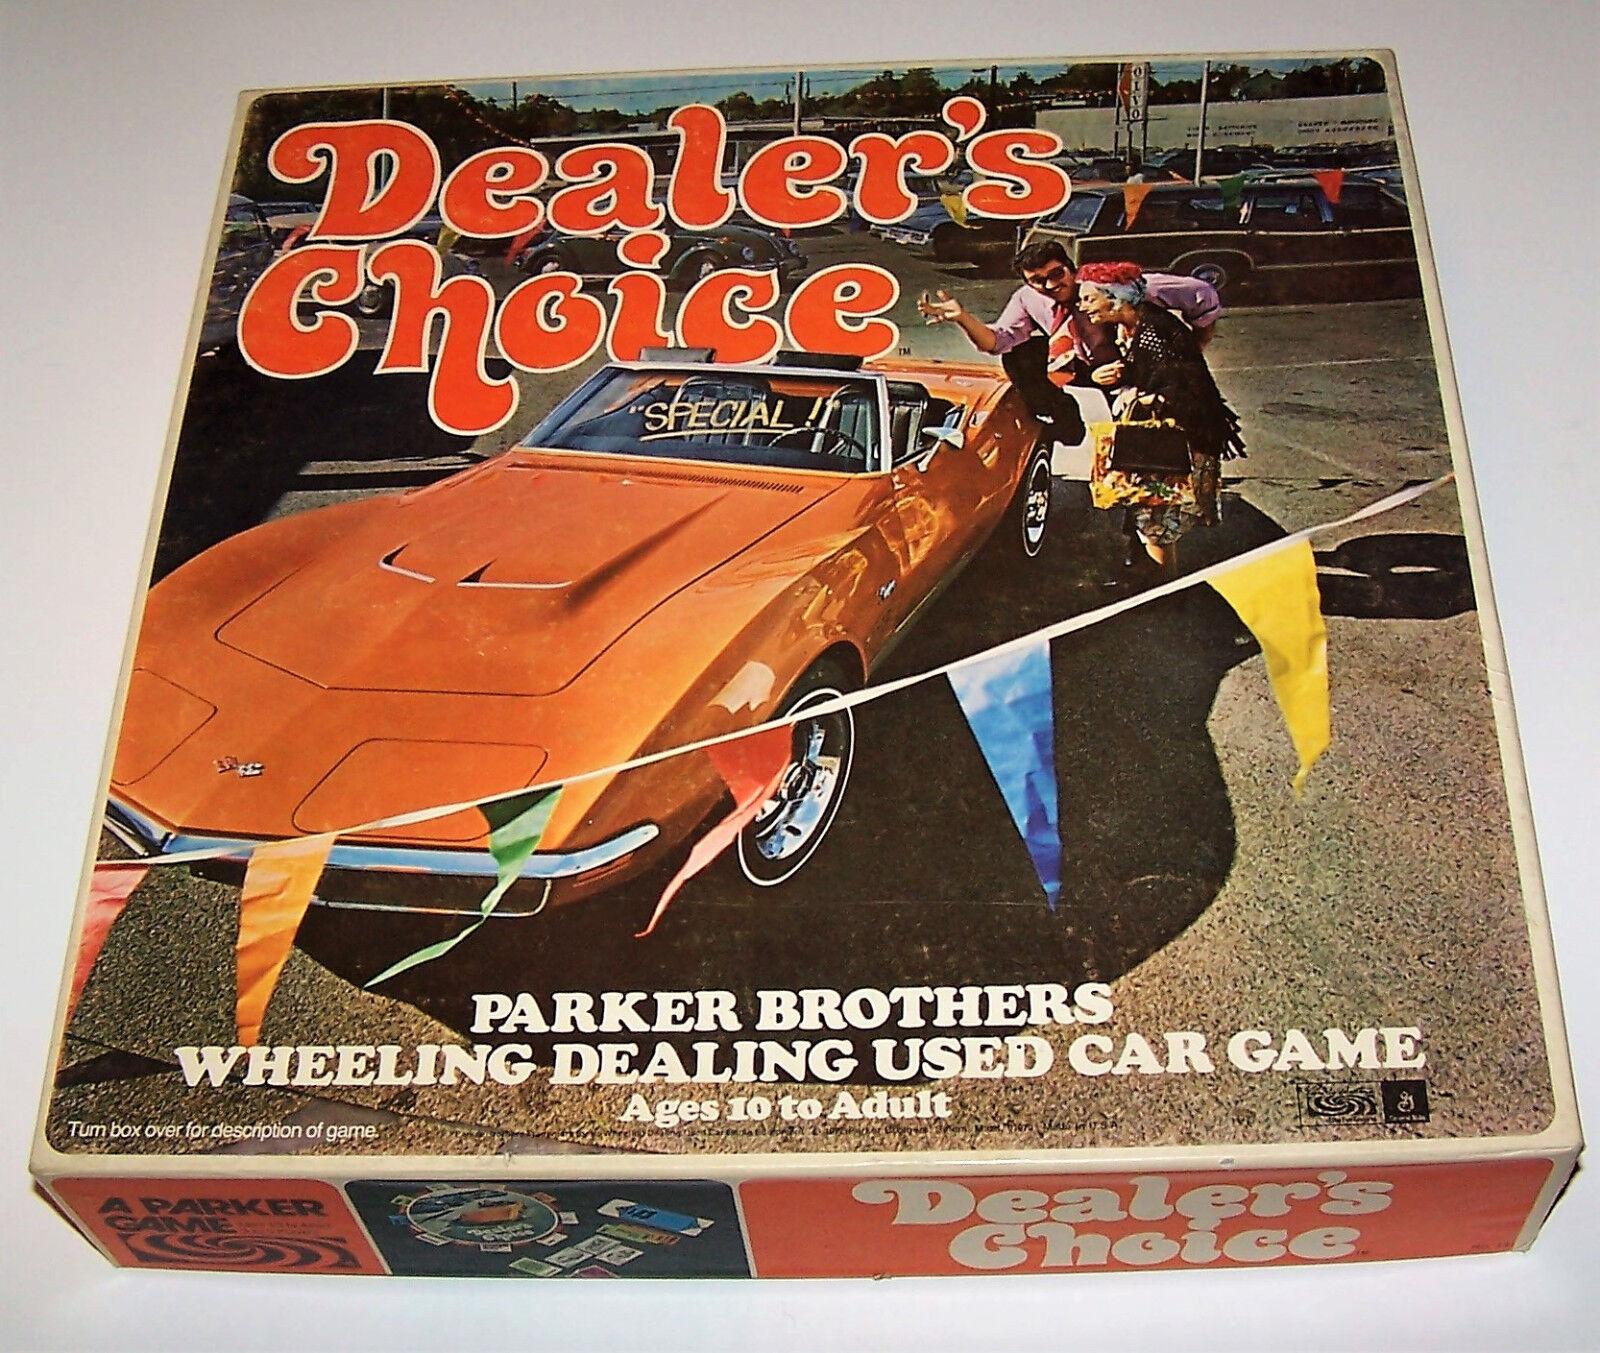 Vintage 1972 Dealer's Choice Parker Bredhers Wheeling Dealing Used Car Game NICE